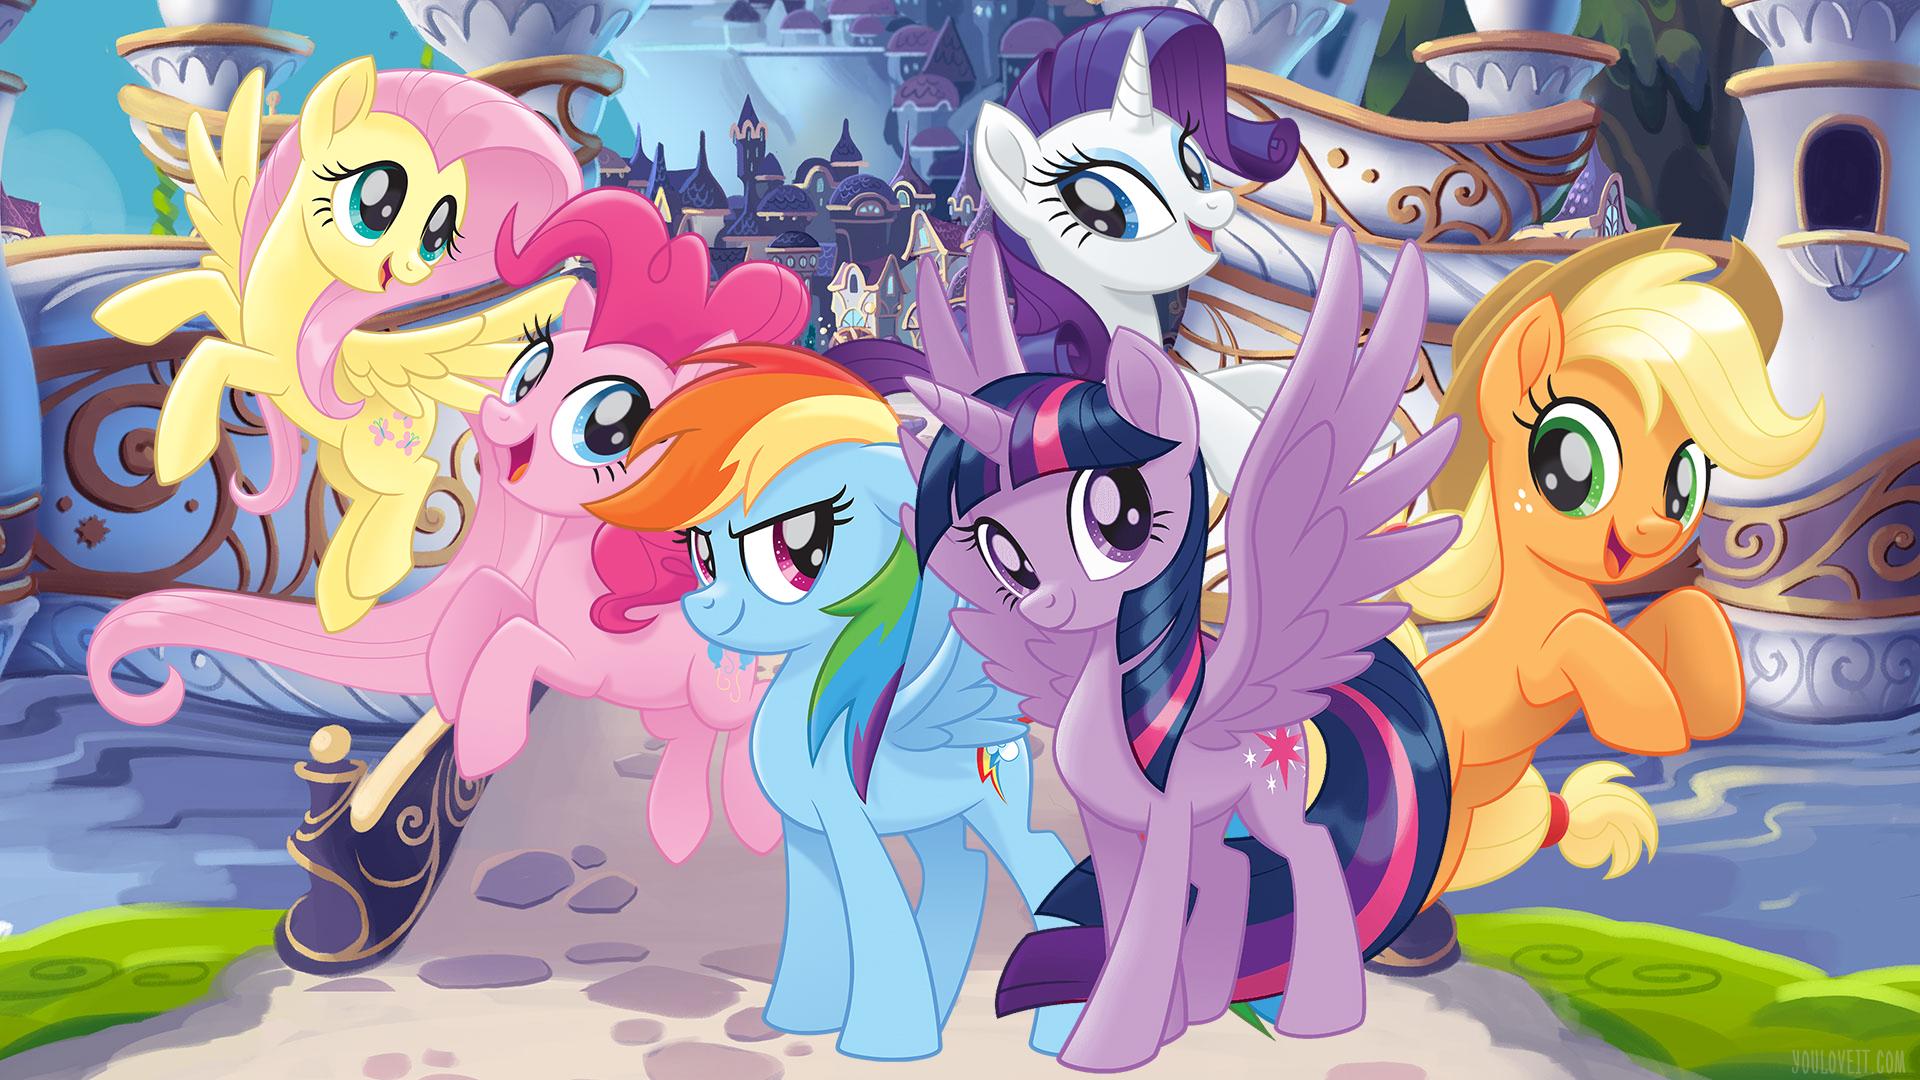 My Little Pony The Movie Wallpaper - My Little Pony Wallpaper Hd - HD Wallpaper